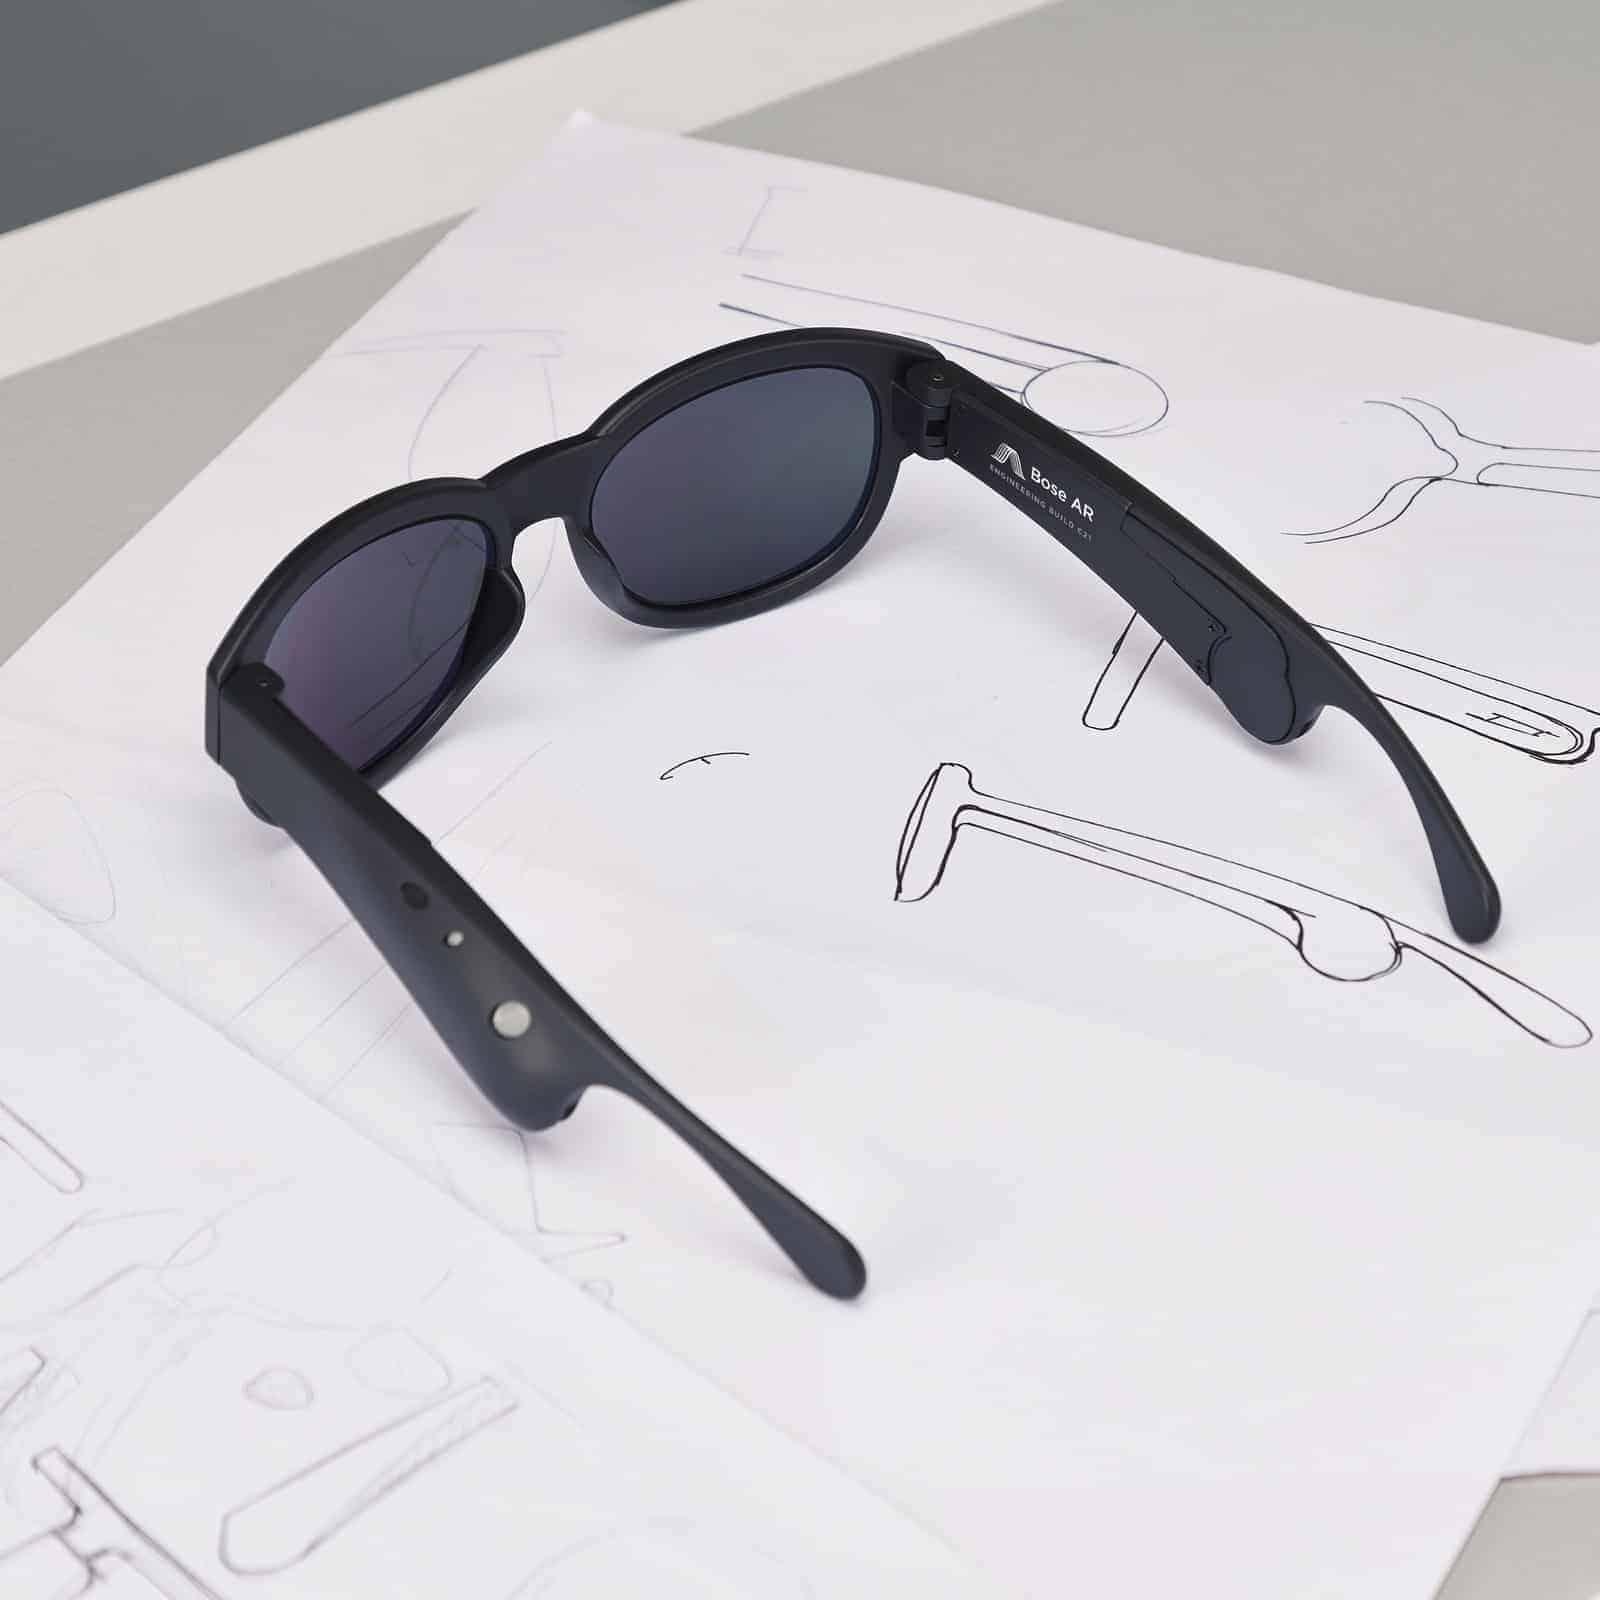 Bose AR Glasses 2